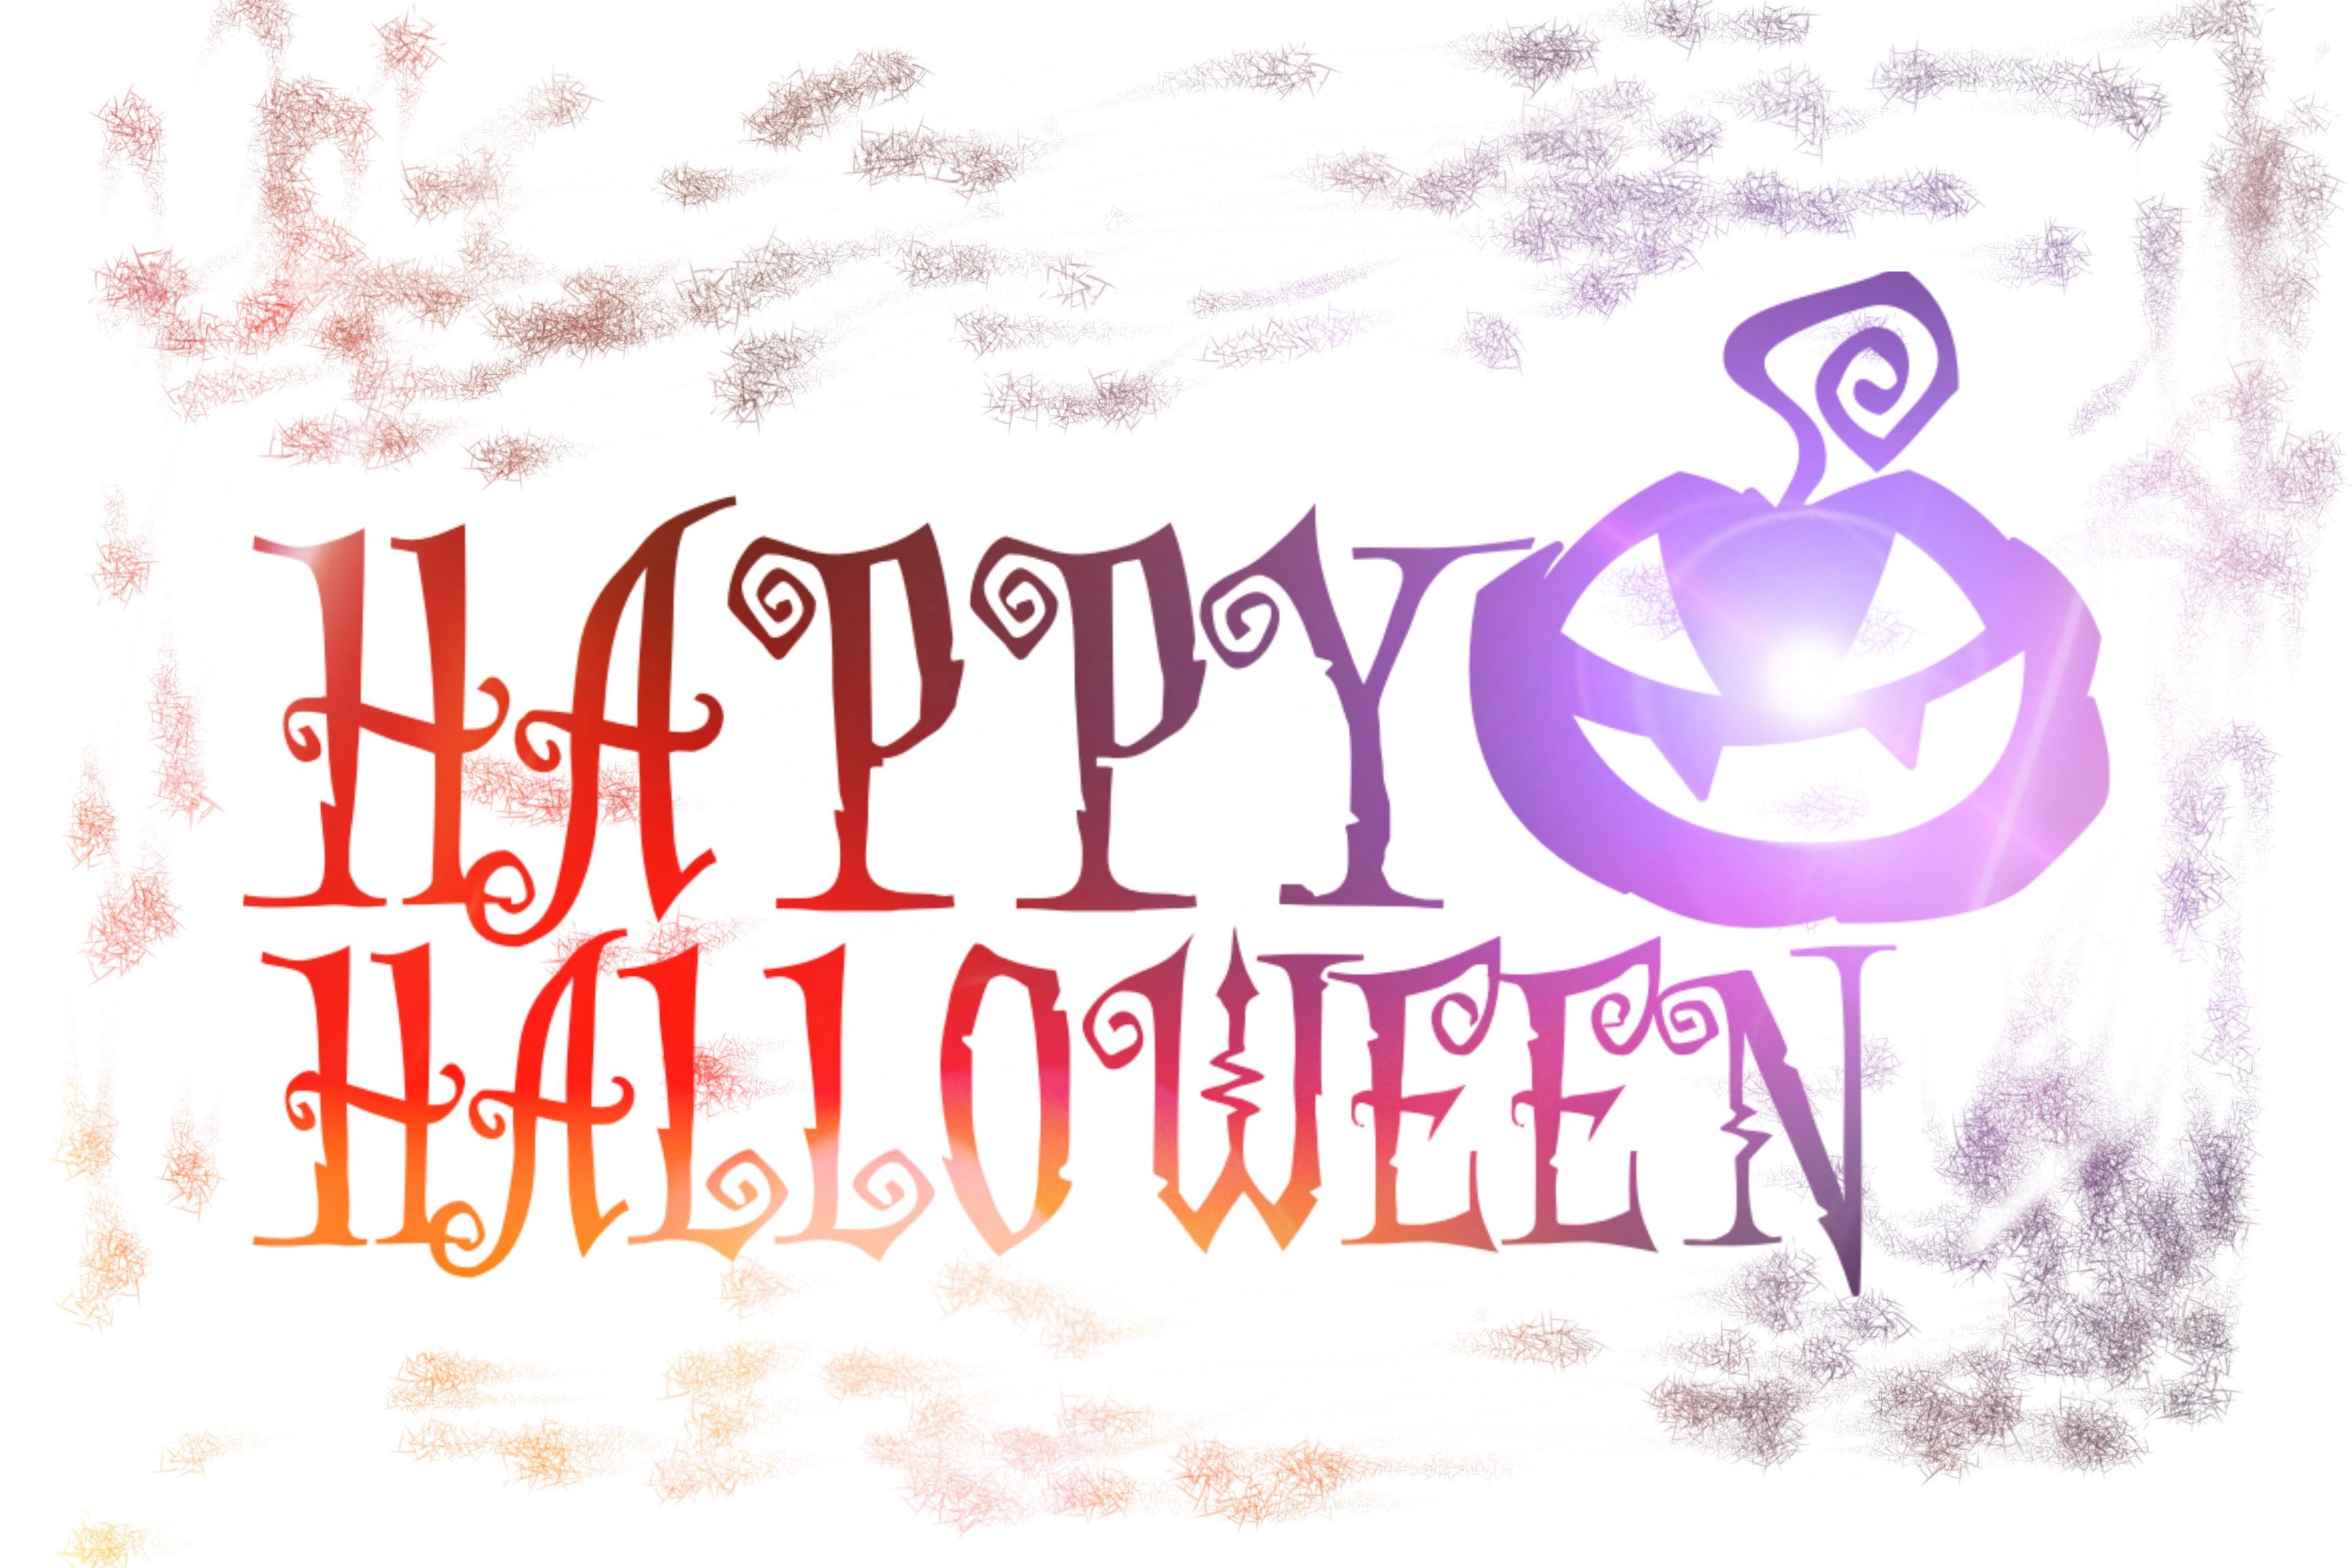 Atmosphere Autumn Halloween Brand Font Fun Illustration Logo Text Decorative Fash 31oktober